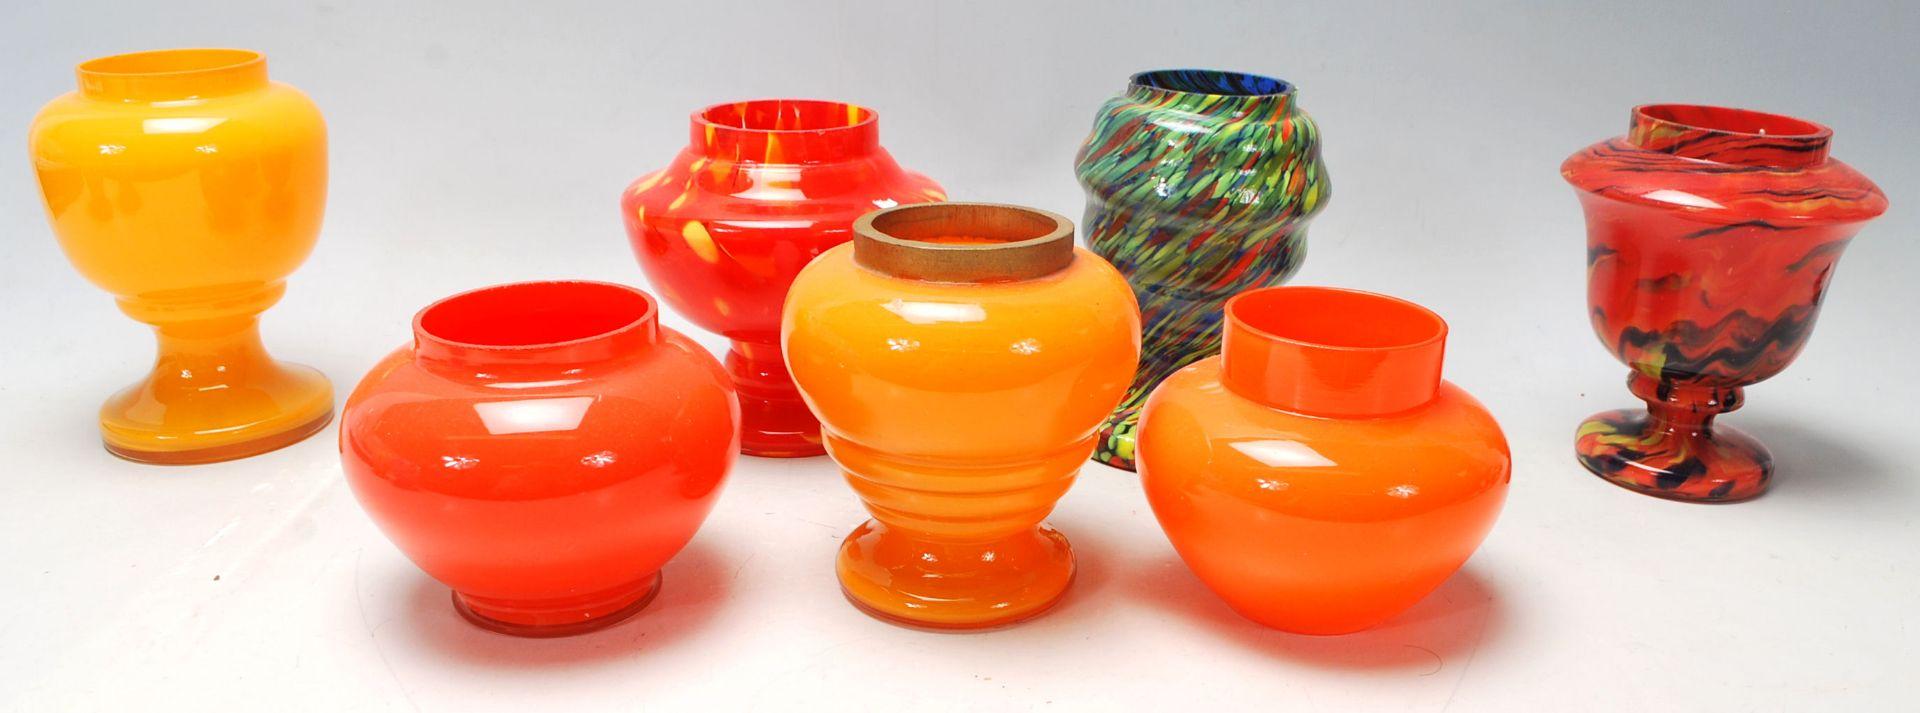 Los 17 - A collection of nine vintage 20th Century Czechoslovakian studio art glass vases in orange, blue